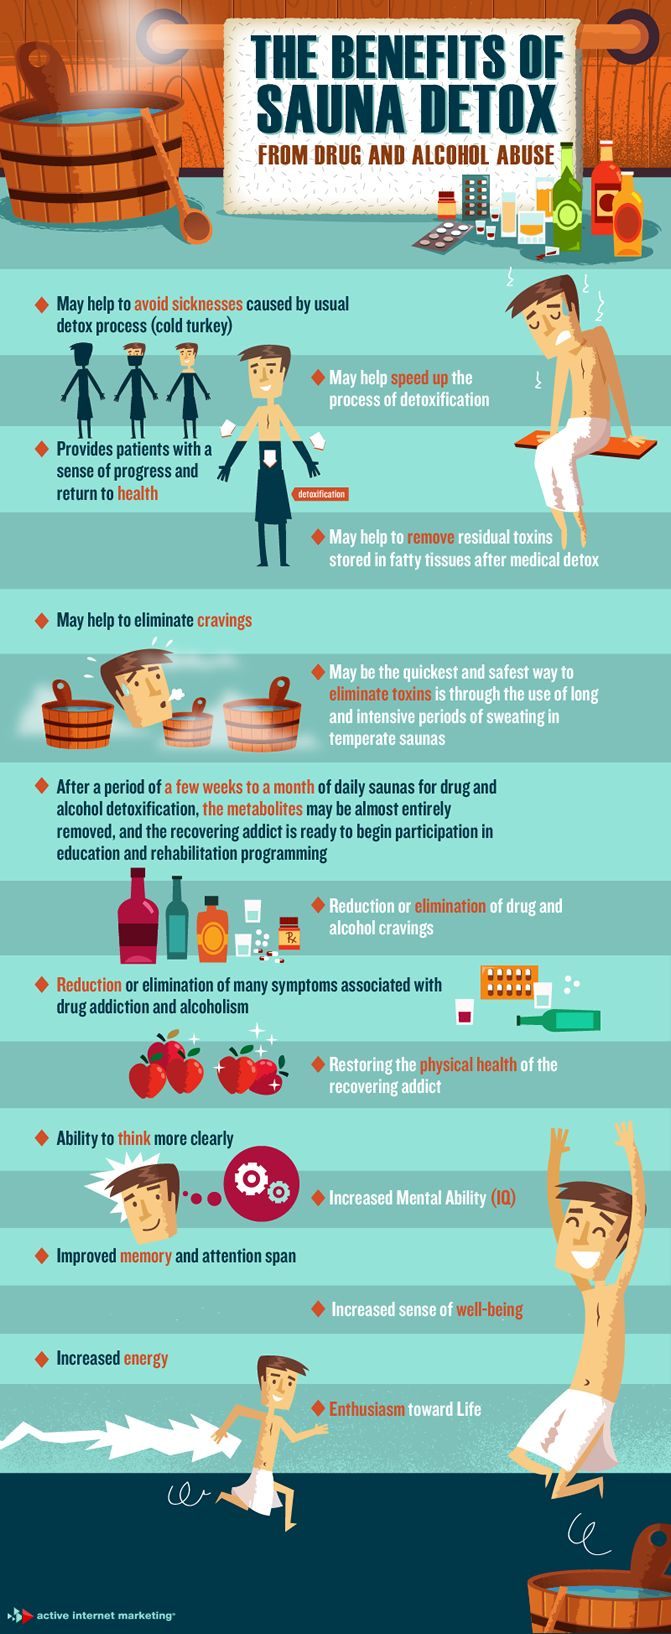 The Benefits of Sauna Detox #infografia #infographic #health